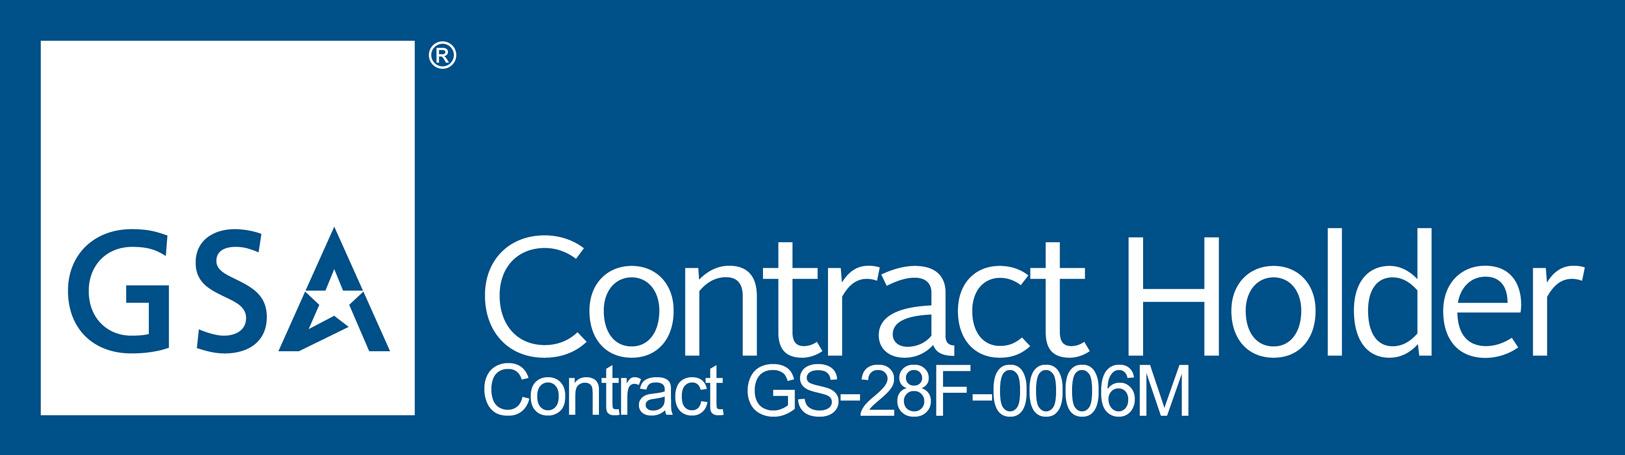 GSA_Contract_Holder_StarMark-CCI.jpg